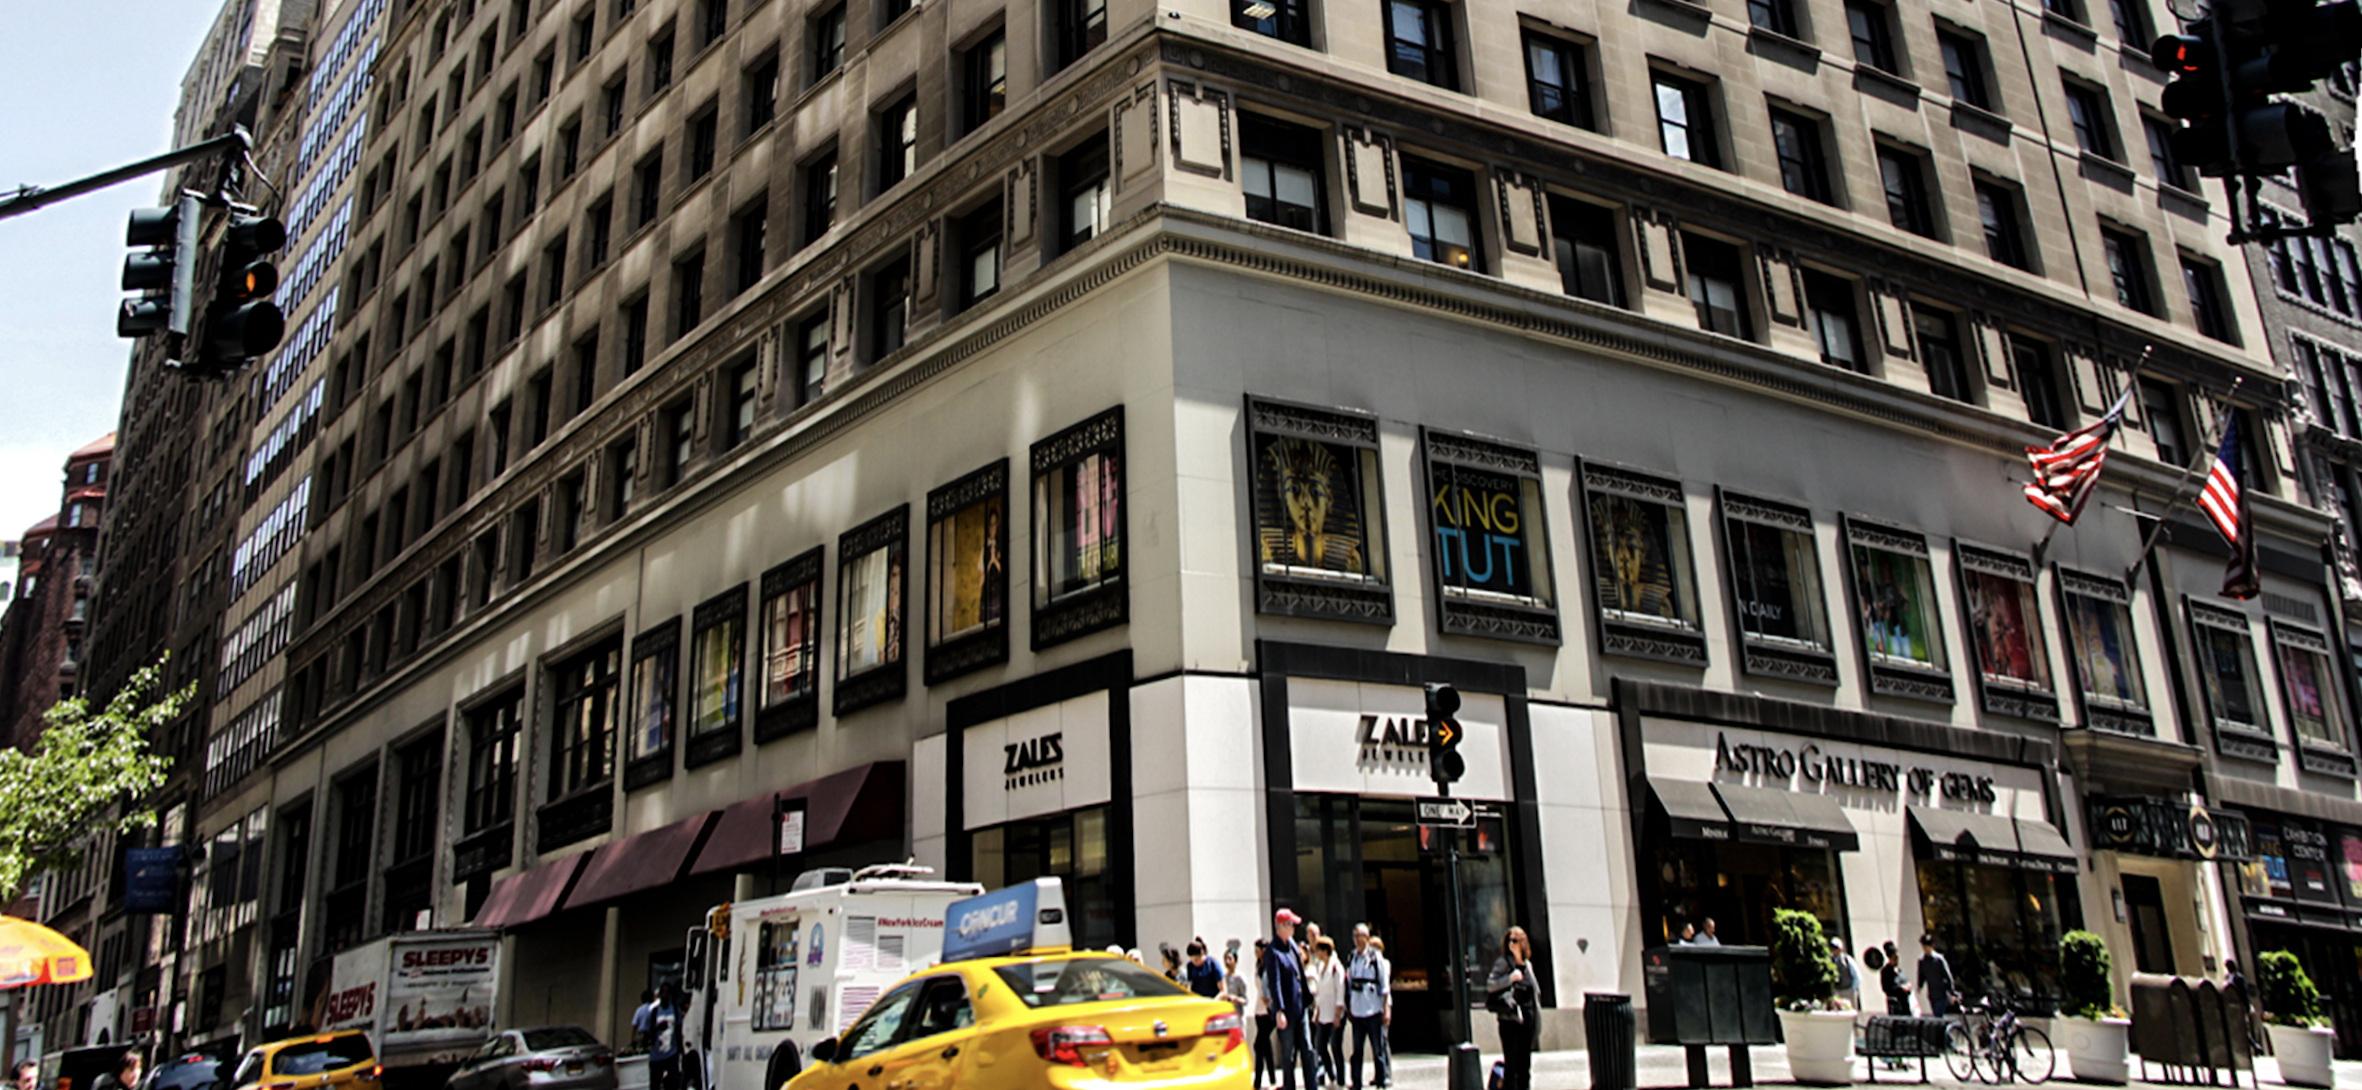 417 fifth avenue -